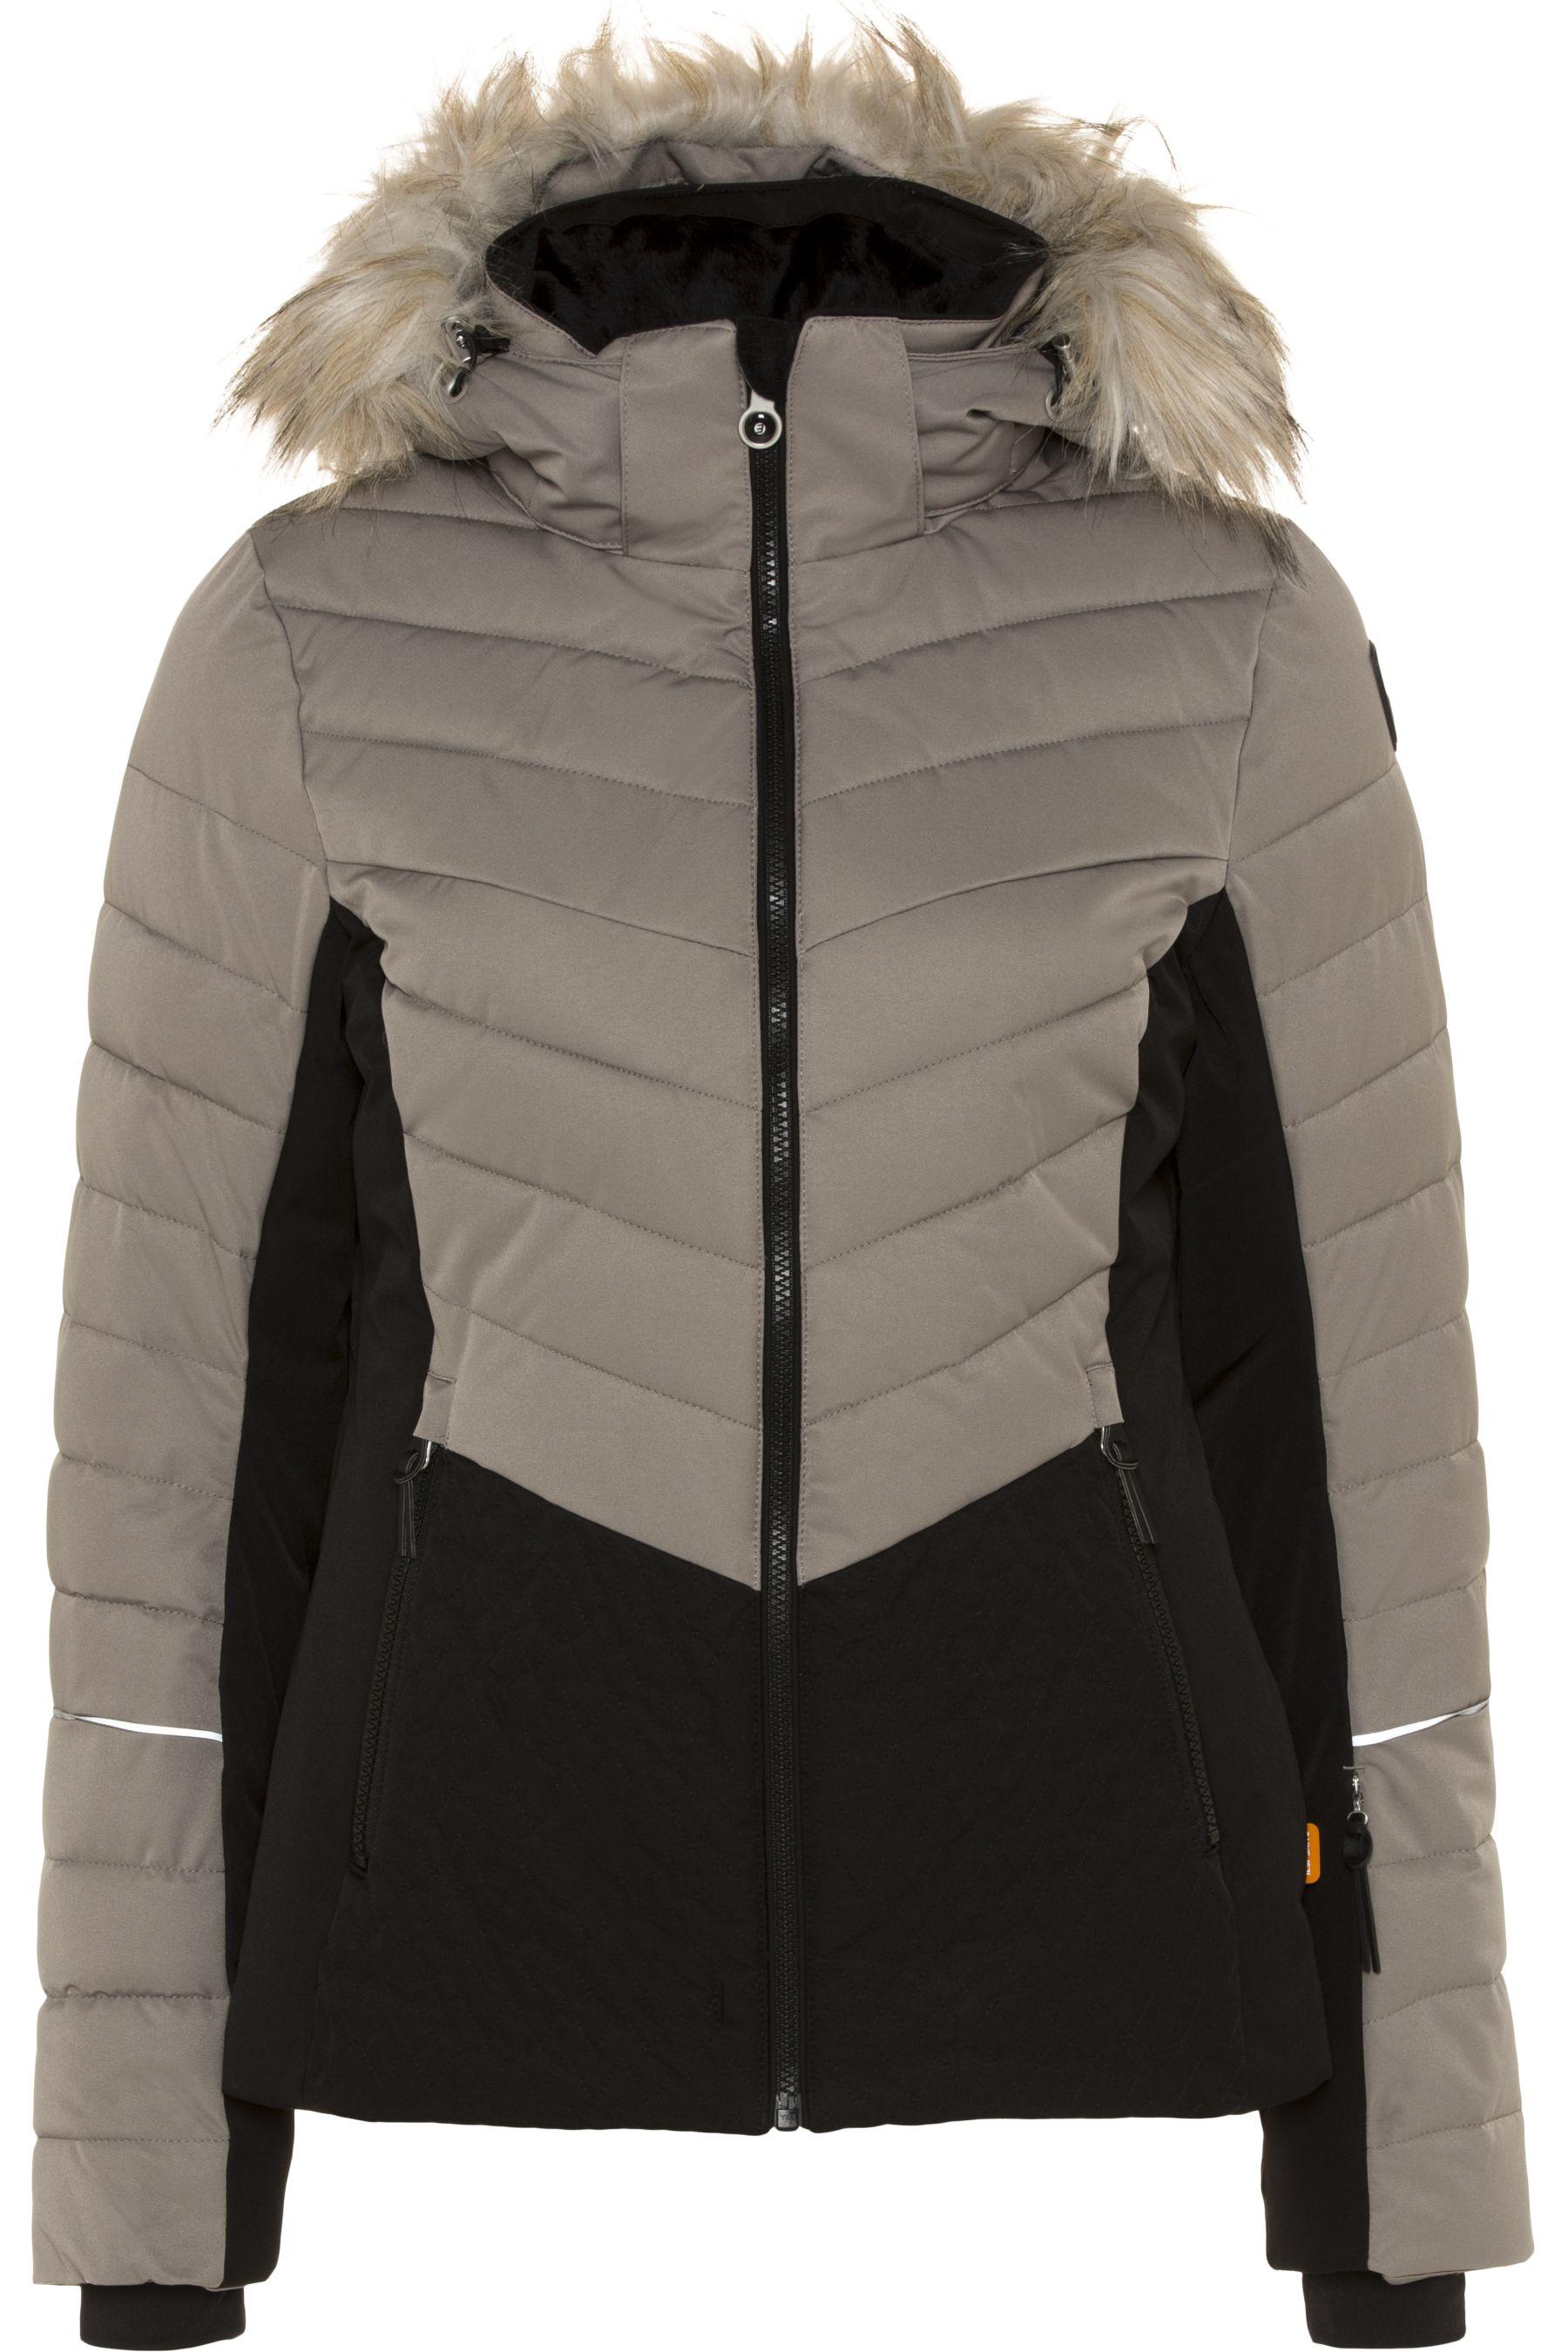 Details zu Icepeak Damen Charlie IX Jacke Skijacke Taillerte Passform Kapuze Khaki 36